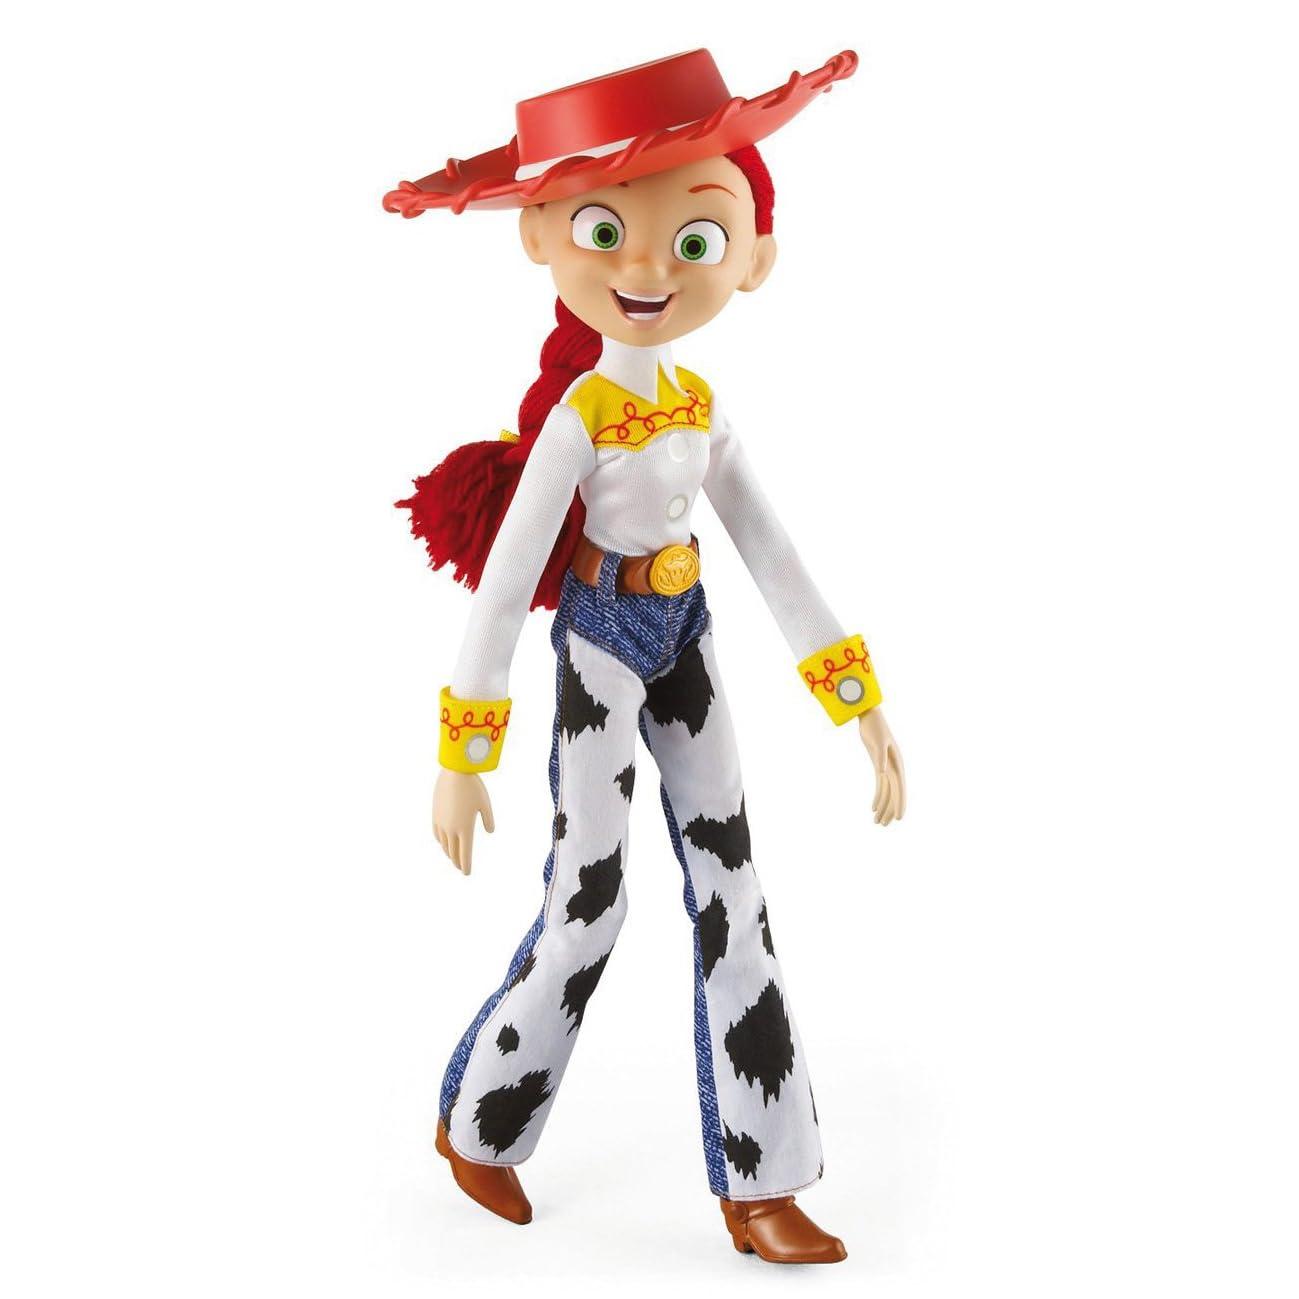 Pin Muñeca Jessie La Vaquerita Toy Story Envío Gratis Mn4 on Pinterest